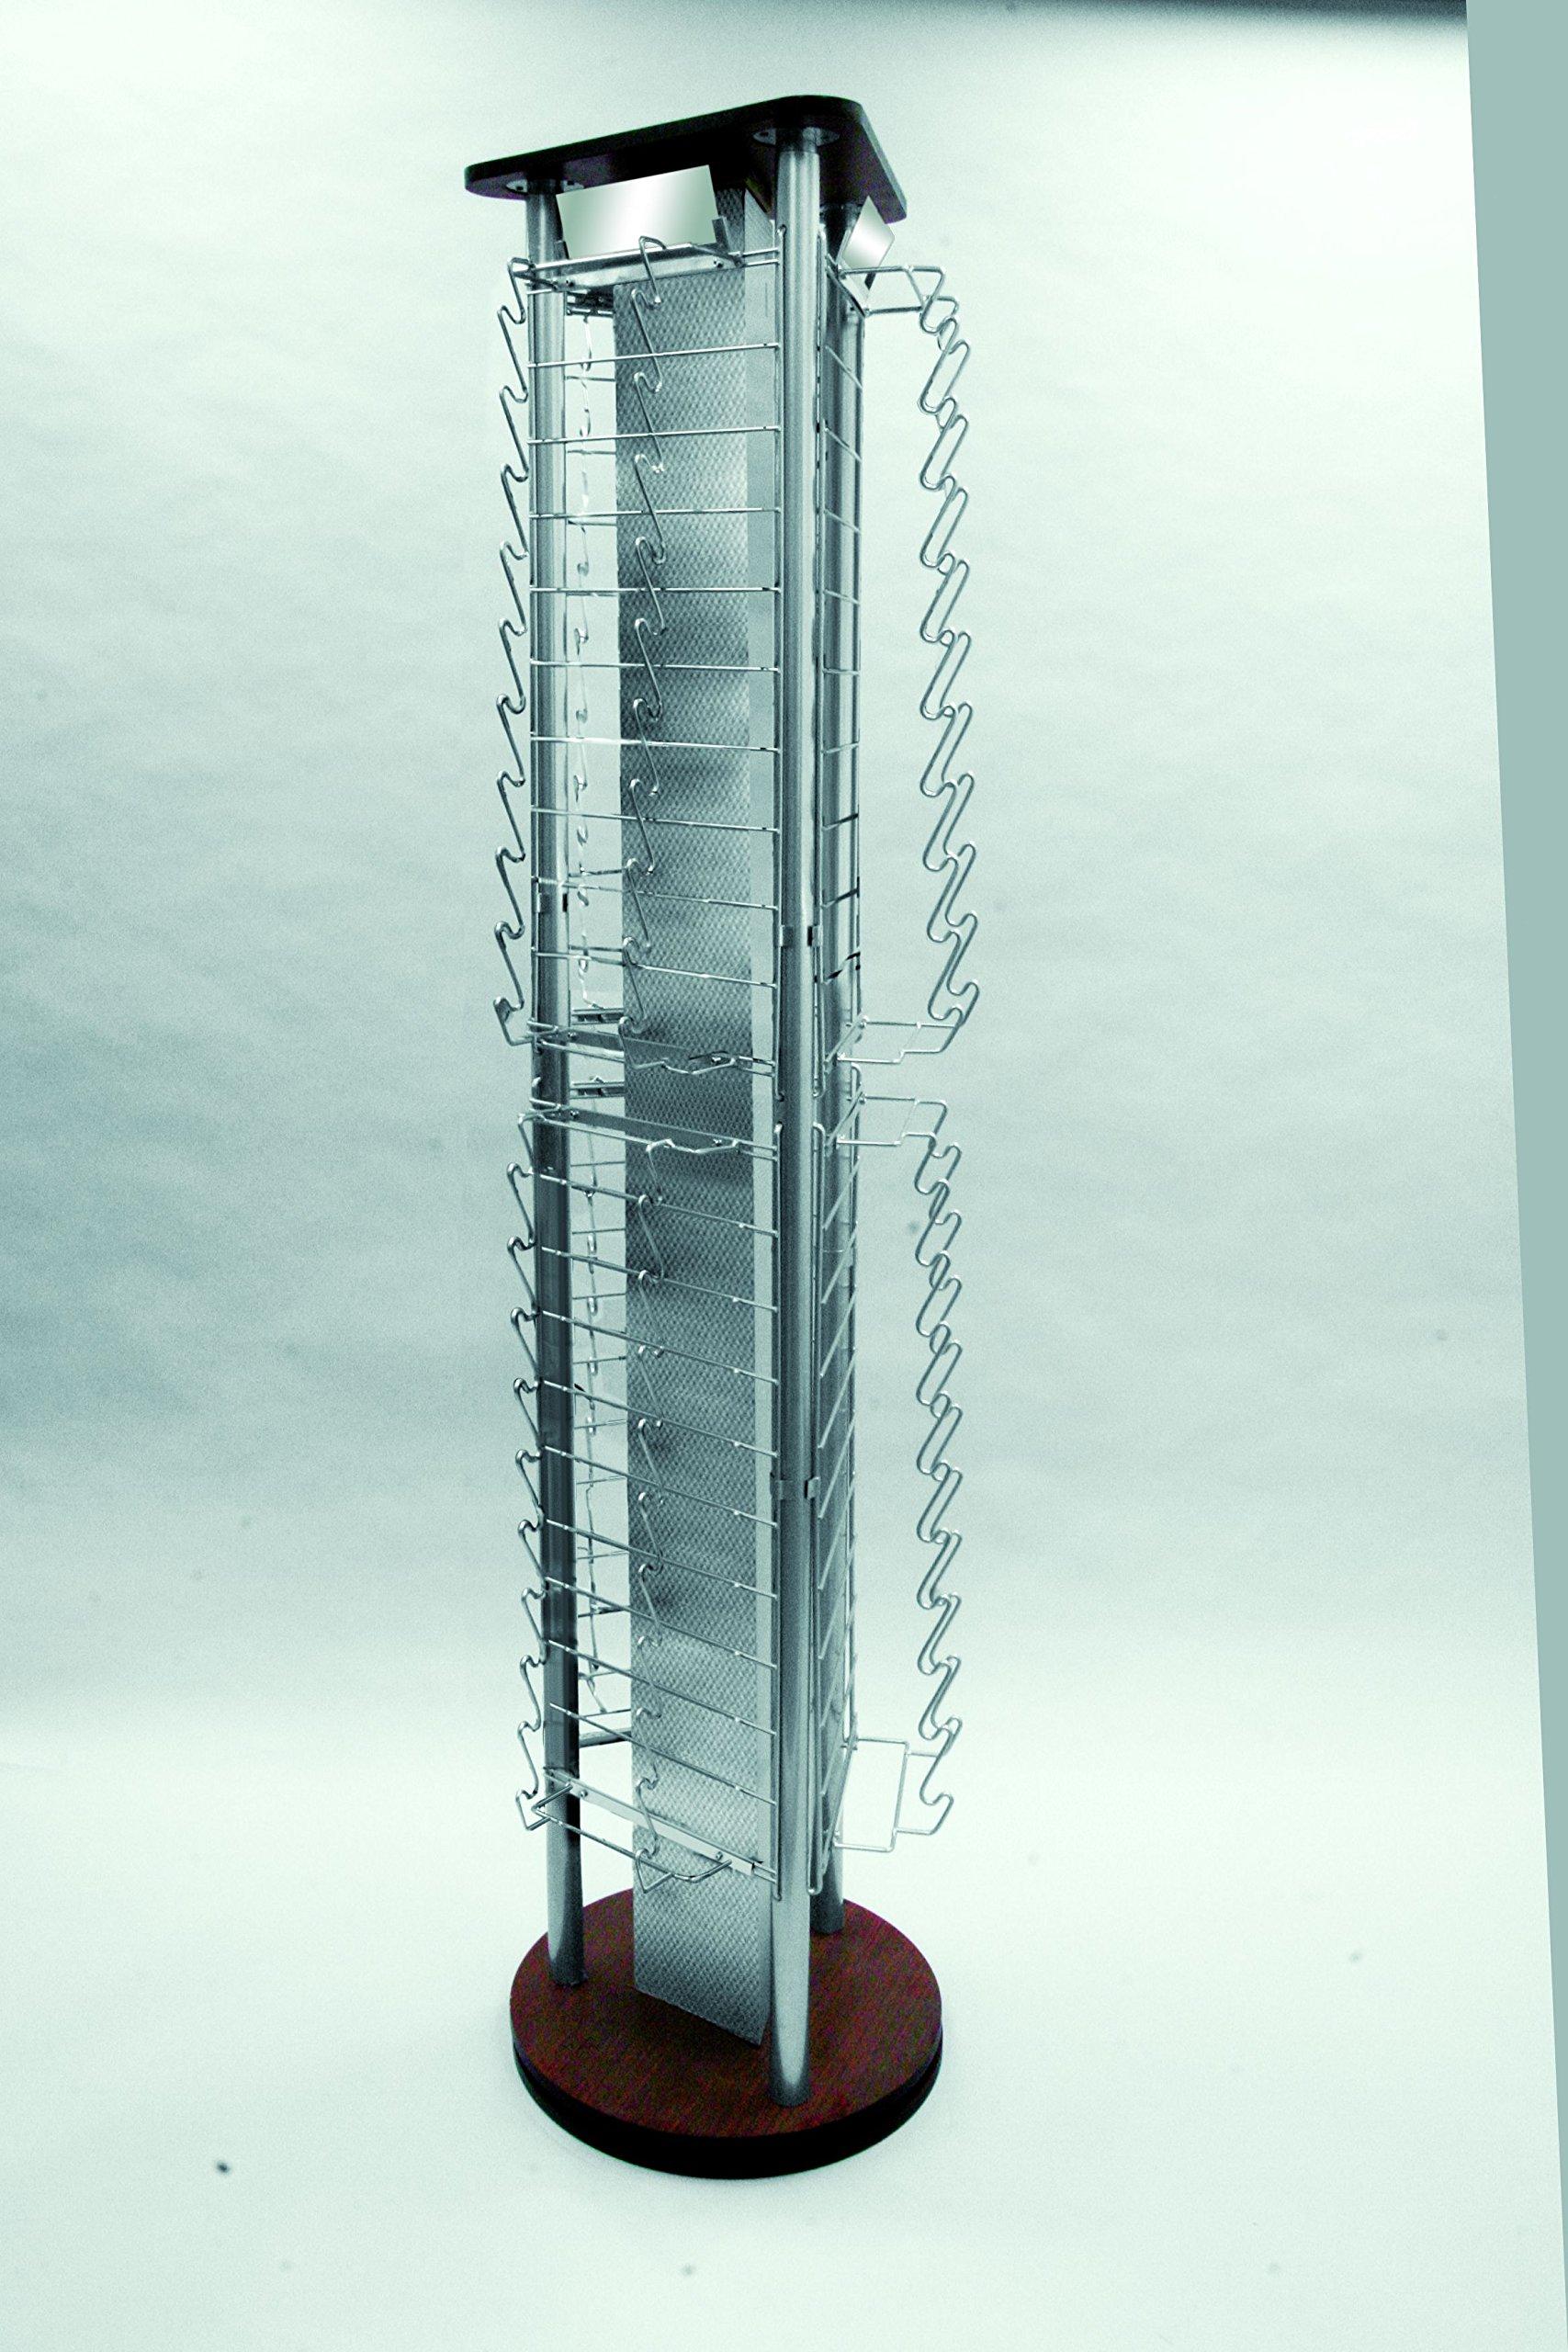 New Retail Sunglass Display Rack 120 Pair 3-sided Rotating Chrome Display Rack